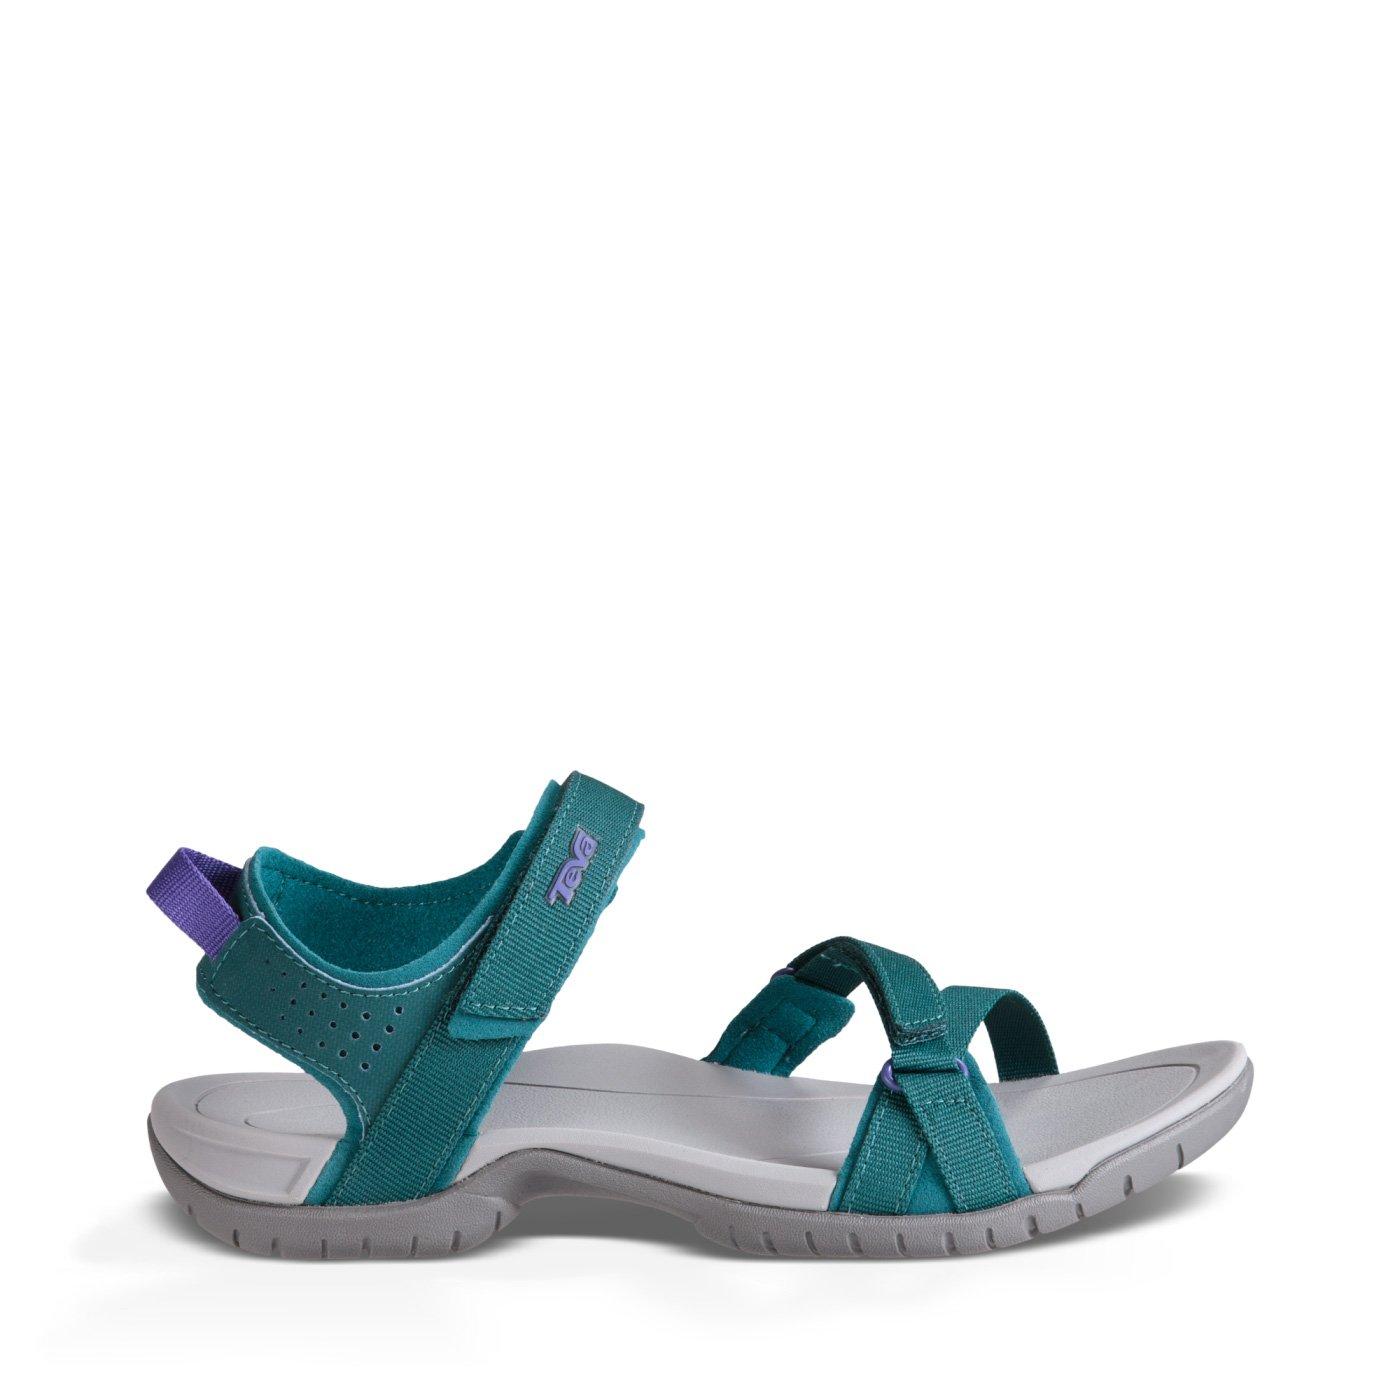 Teva Women's Verra Sandal B07DHMN9JQ 38-39 M EU / 7.5 B(M) US|Deep Teal